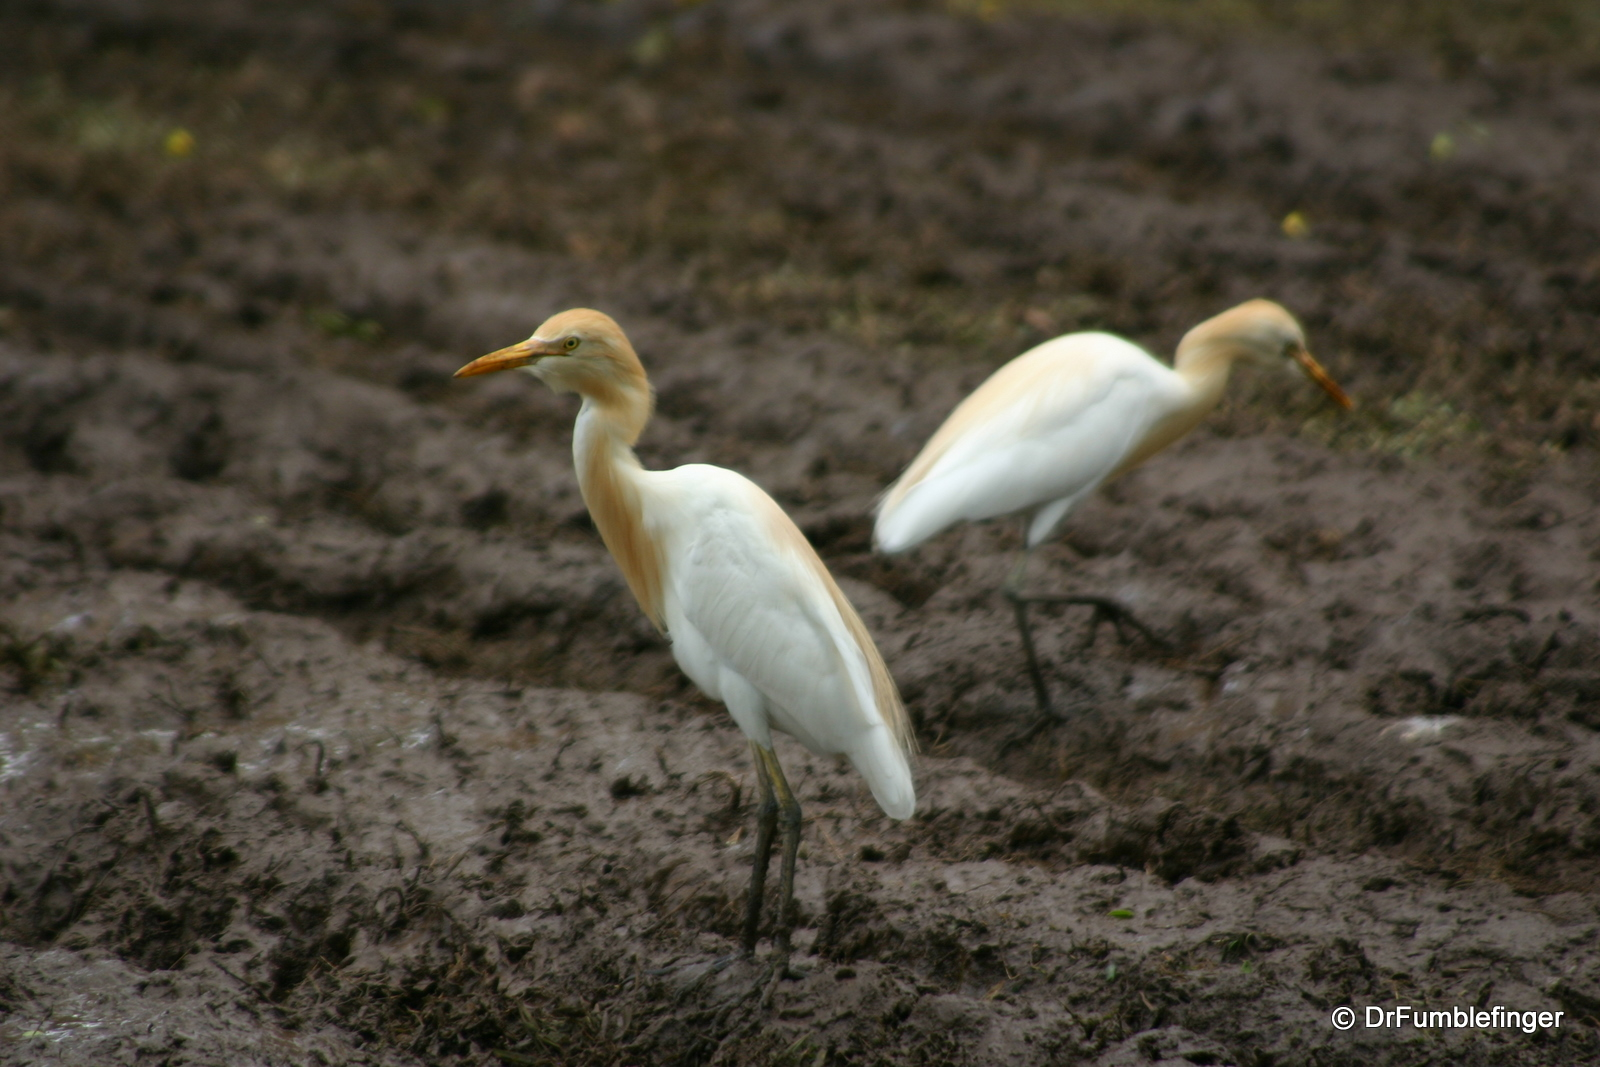 Anuradhapura -- Egrets